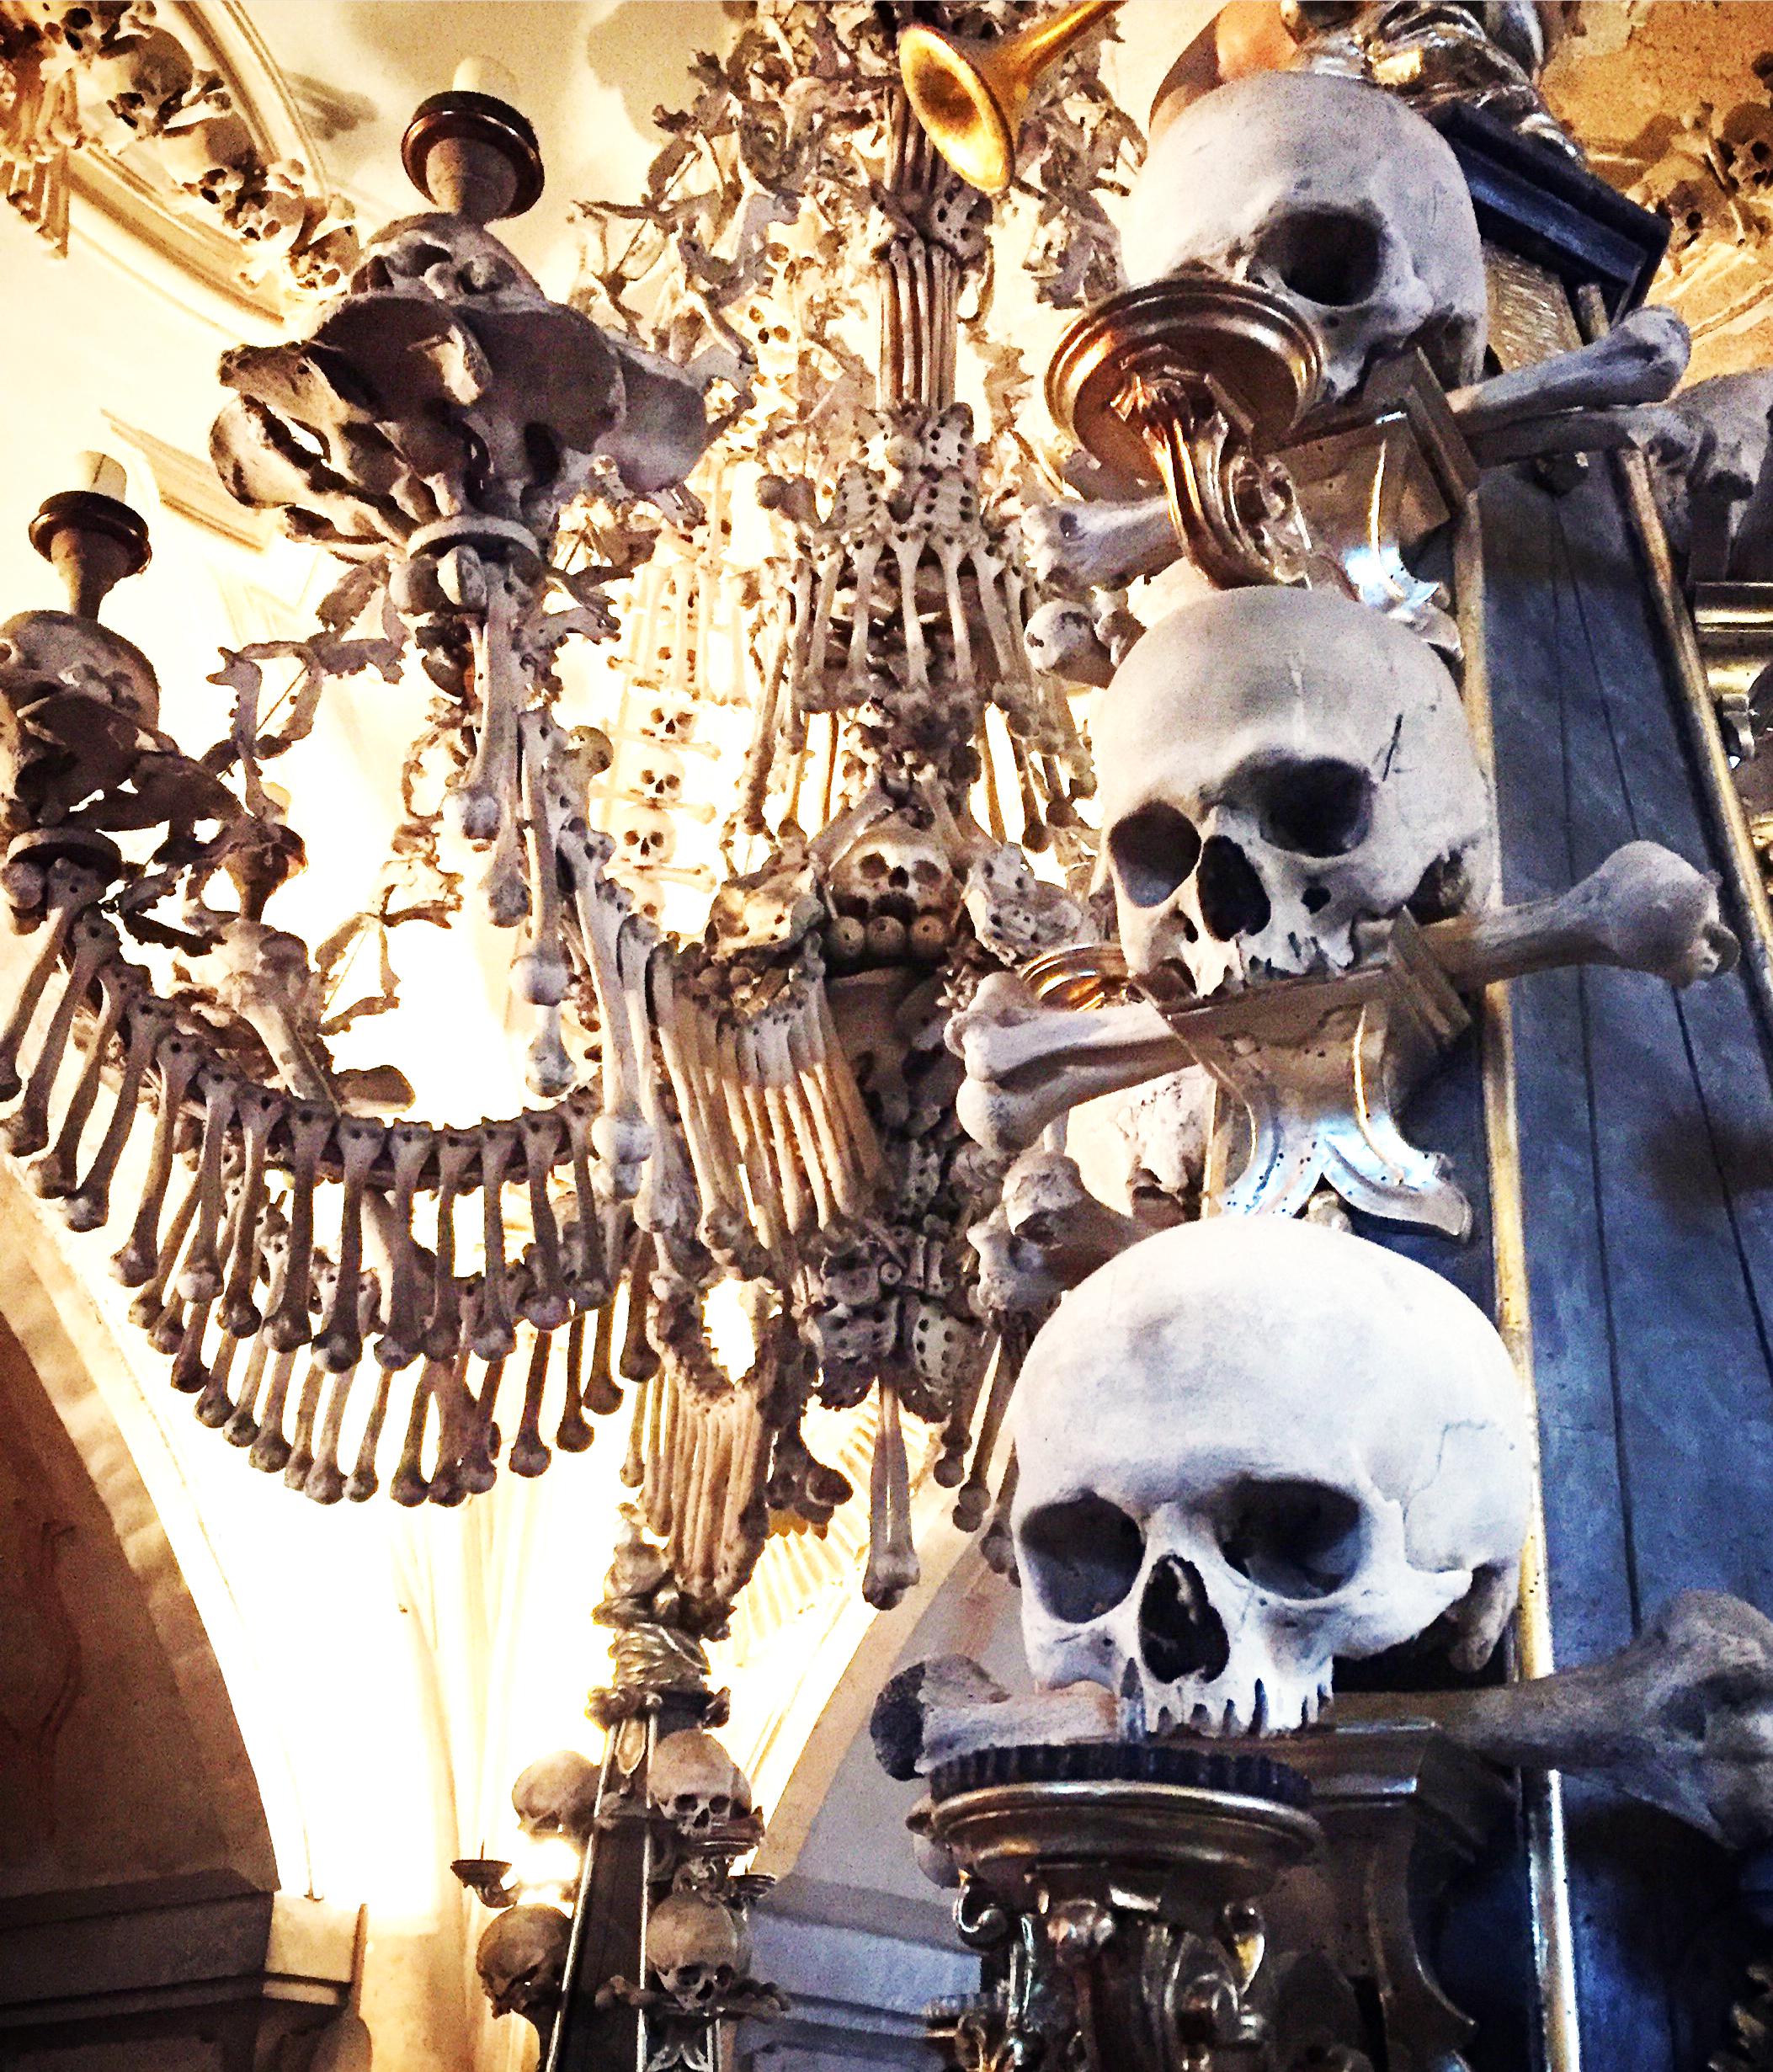 The bone chandelier inside the Bone Church